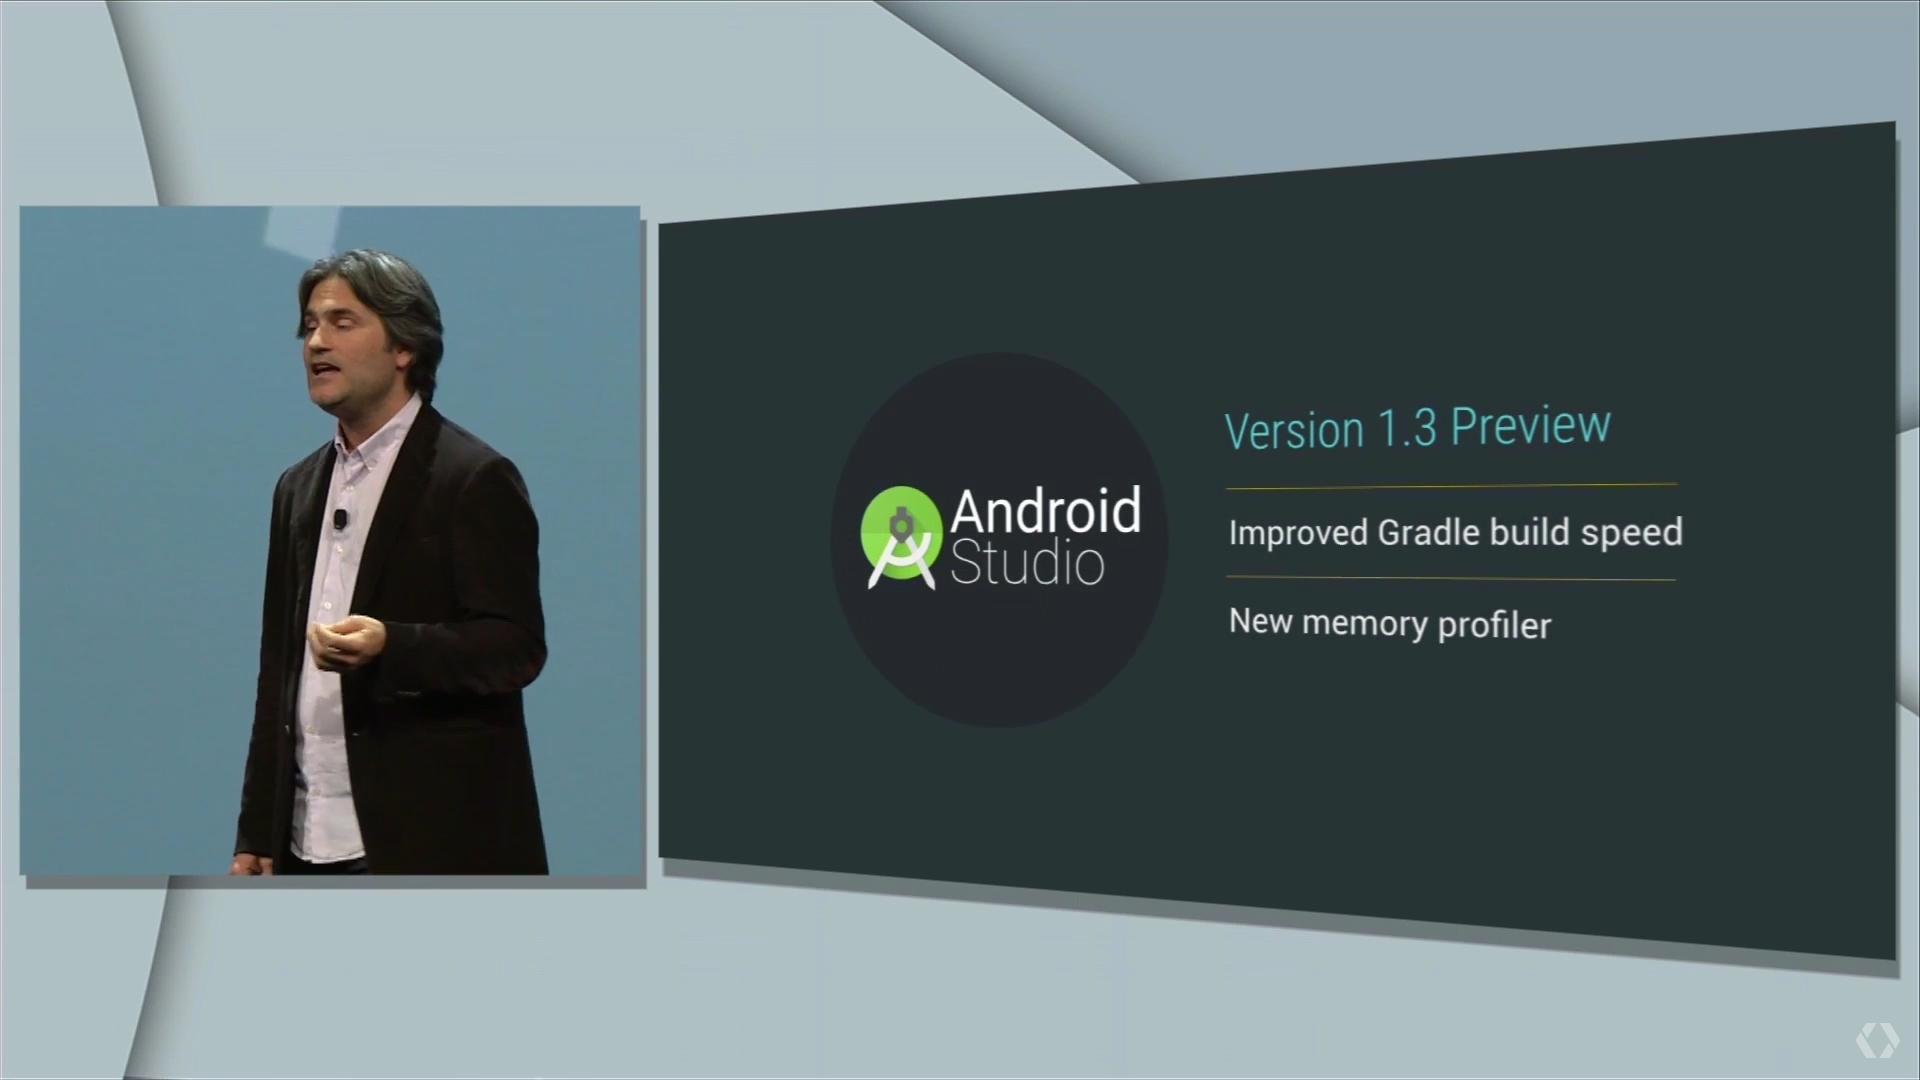 Google IO 2015 android atudio 1.3